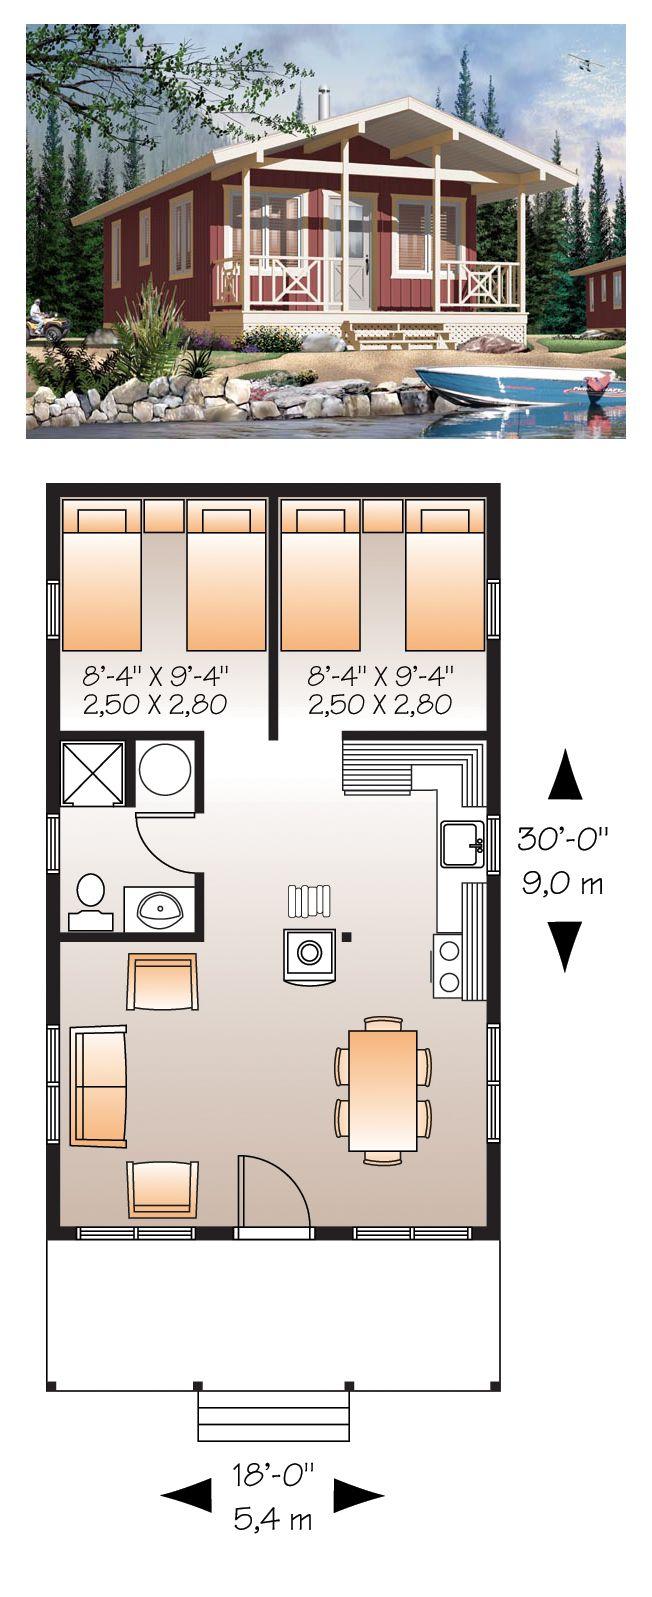 Tiny Micro House Plan 76167 | Total Living Area: 540 sq. ft., 1 bedroom & 1 bathroom. #houseplan #tinyhouse